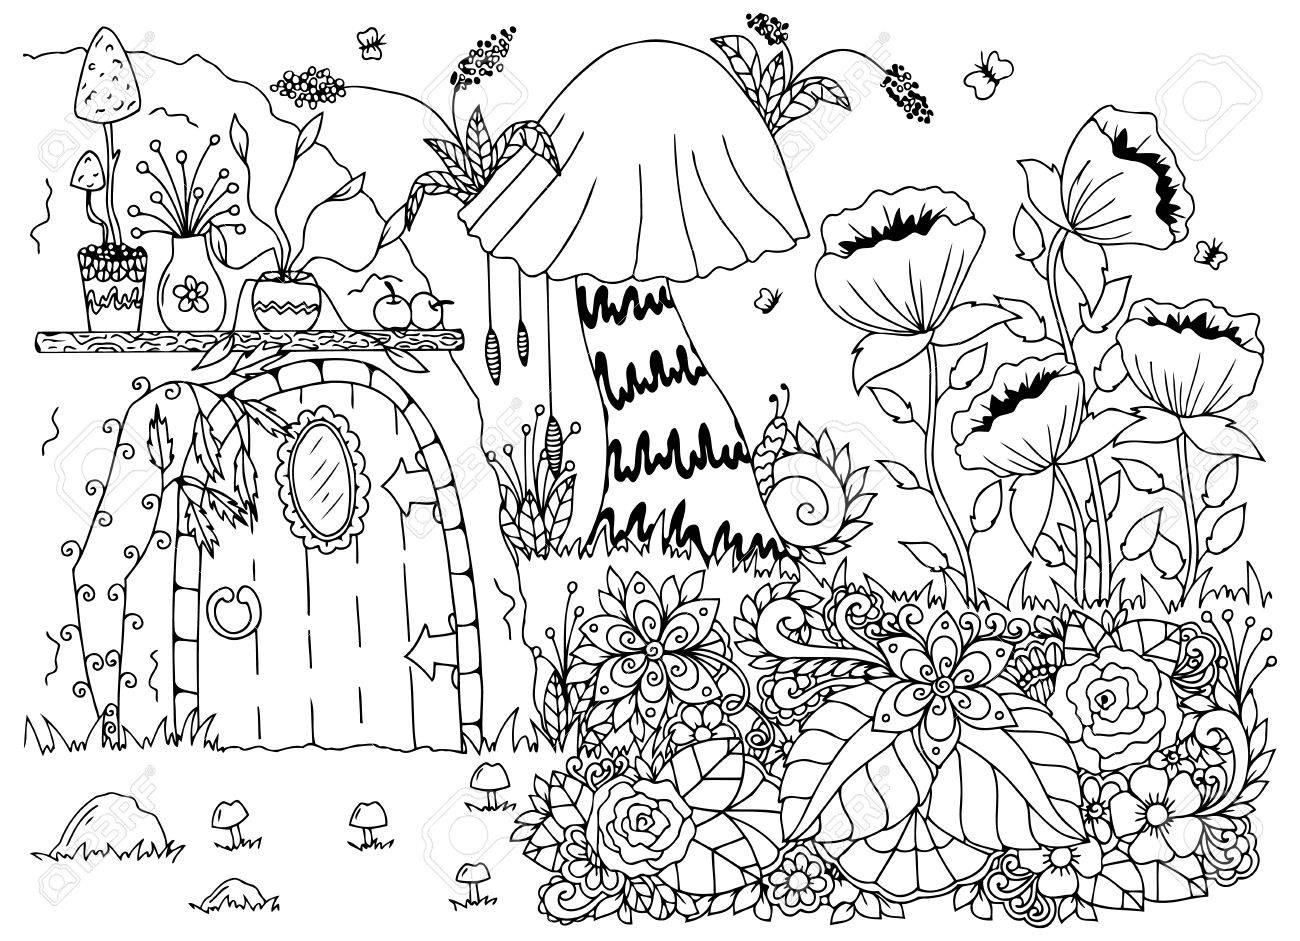 1300x941 Vector Illustration Zentangl House In The Woods, Flowers. Doodle